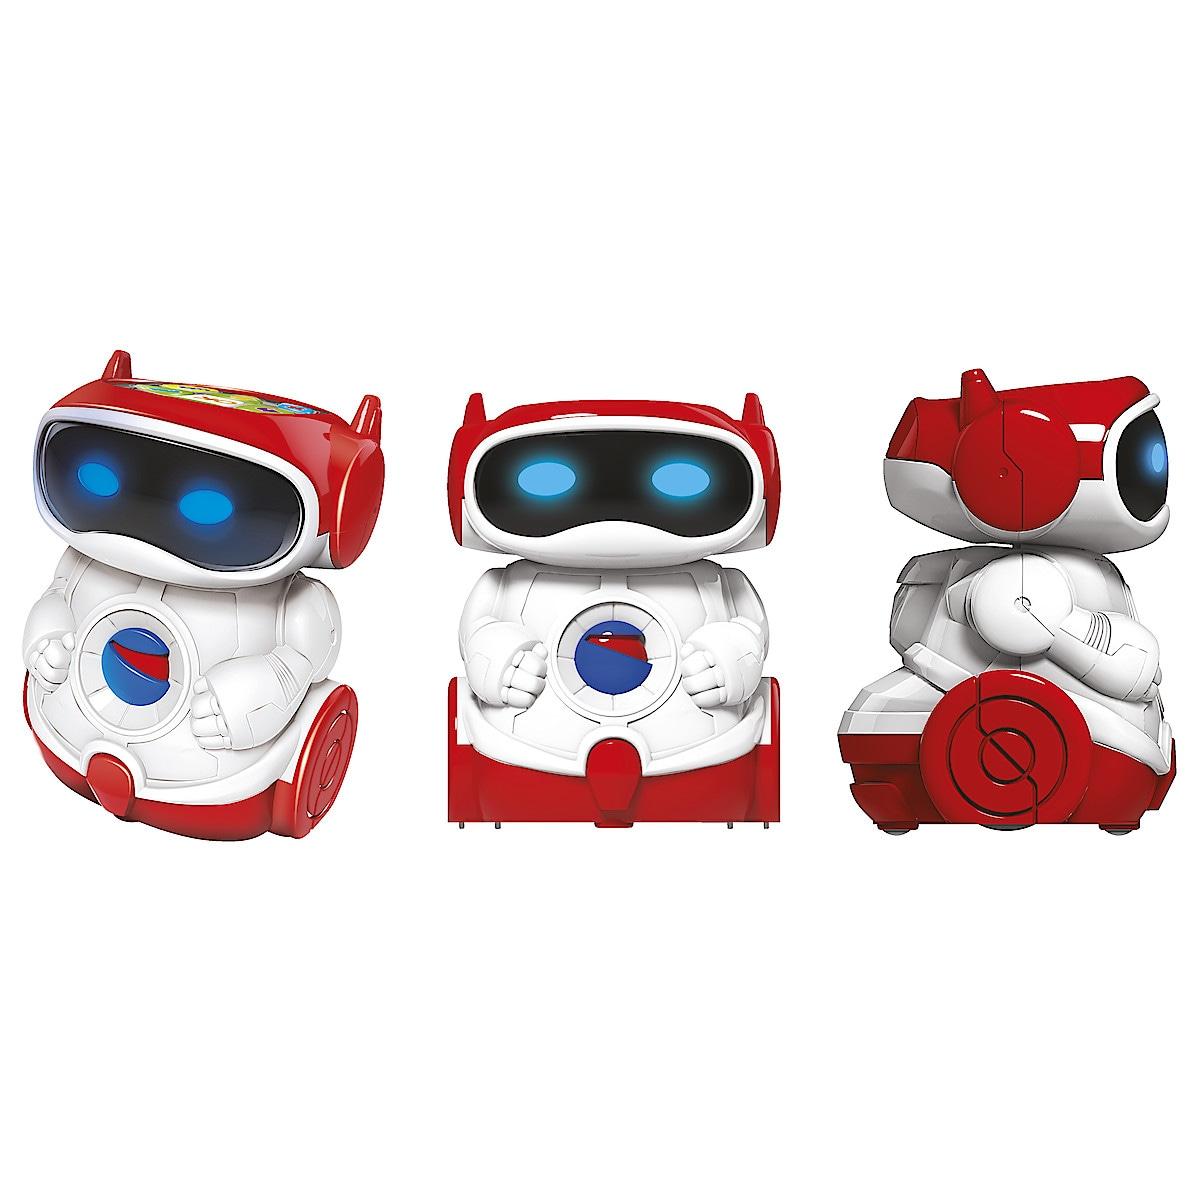 Clementoni, DOC Educational Talking Robot